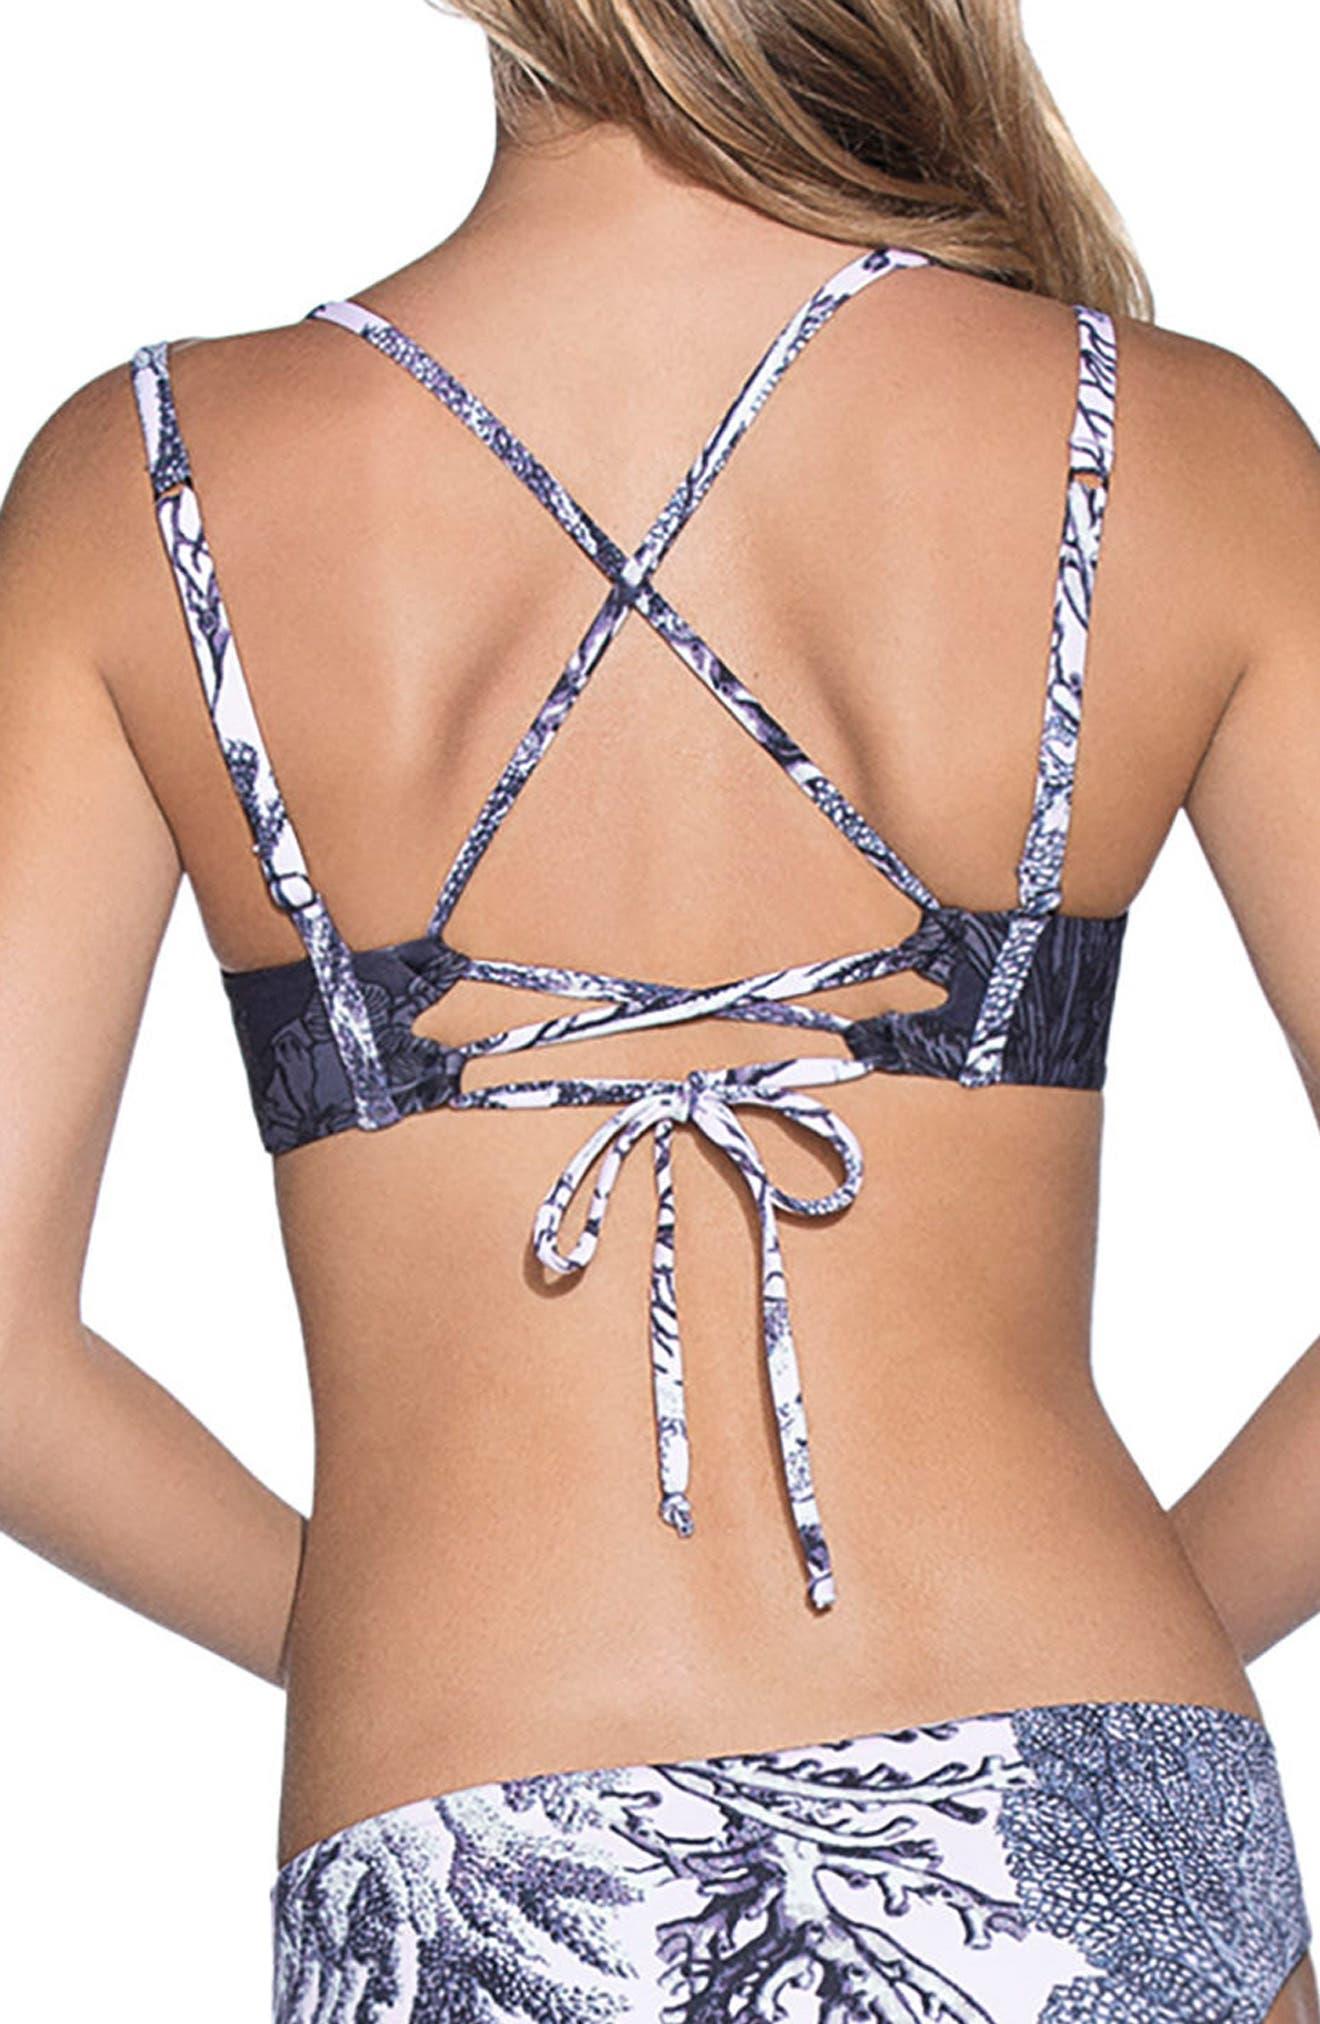 Buenaventura Nights Underwire Bikini Top,                             Alternate thumbnail 2, color,